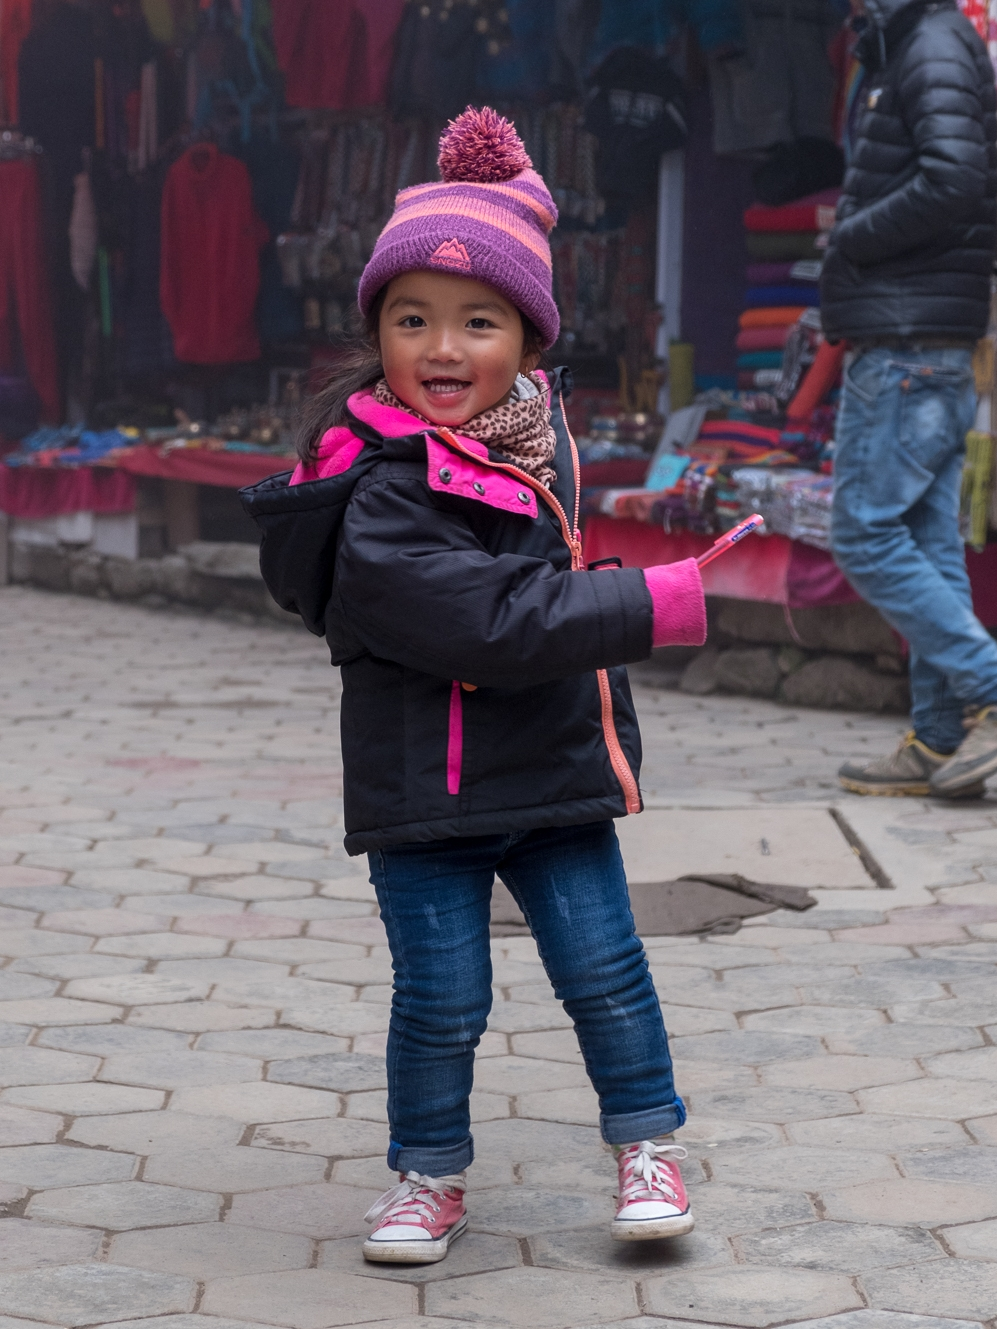 20180505_Namche Bazaar Nepal_0804.jpg